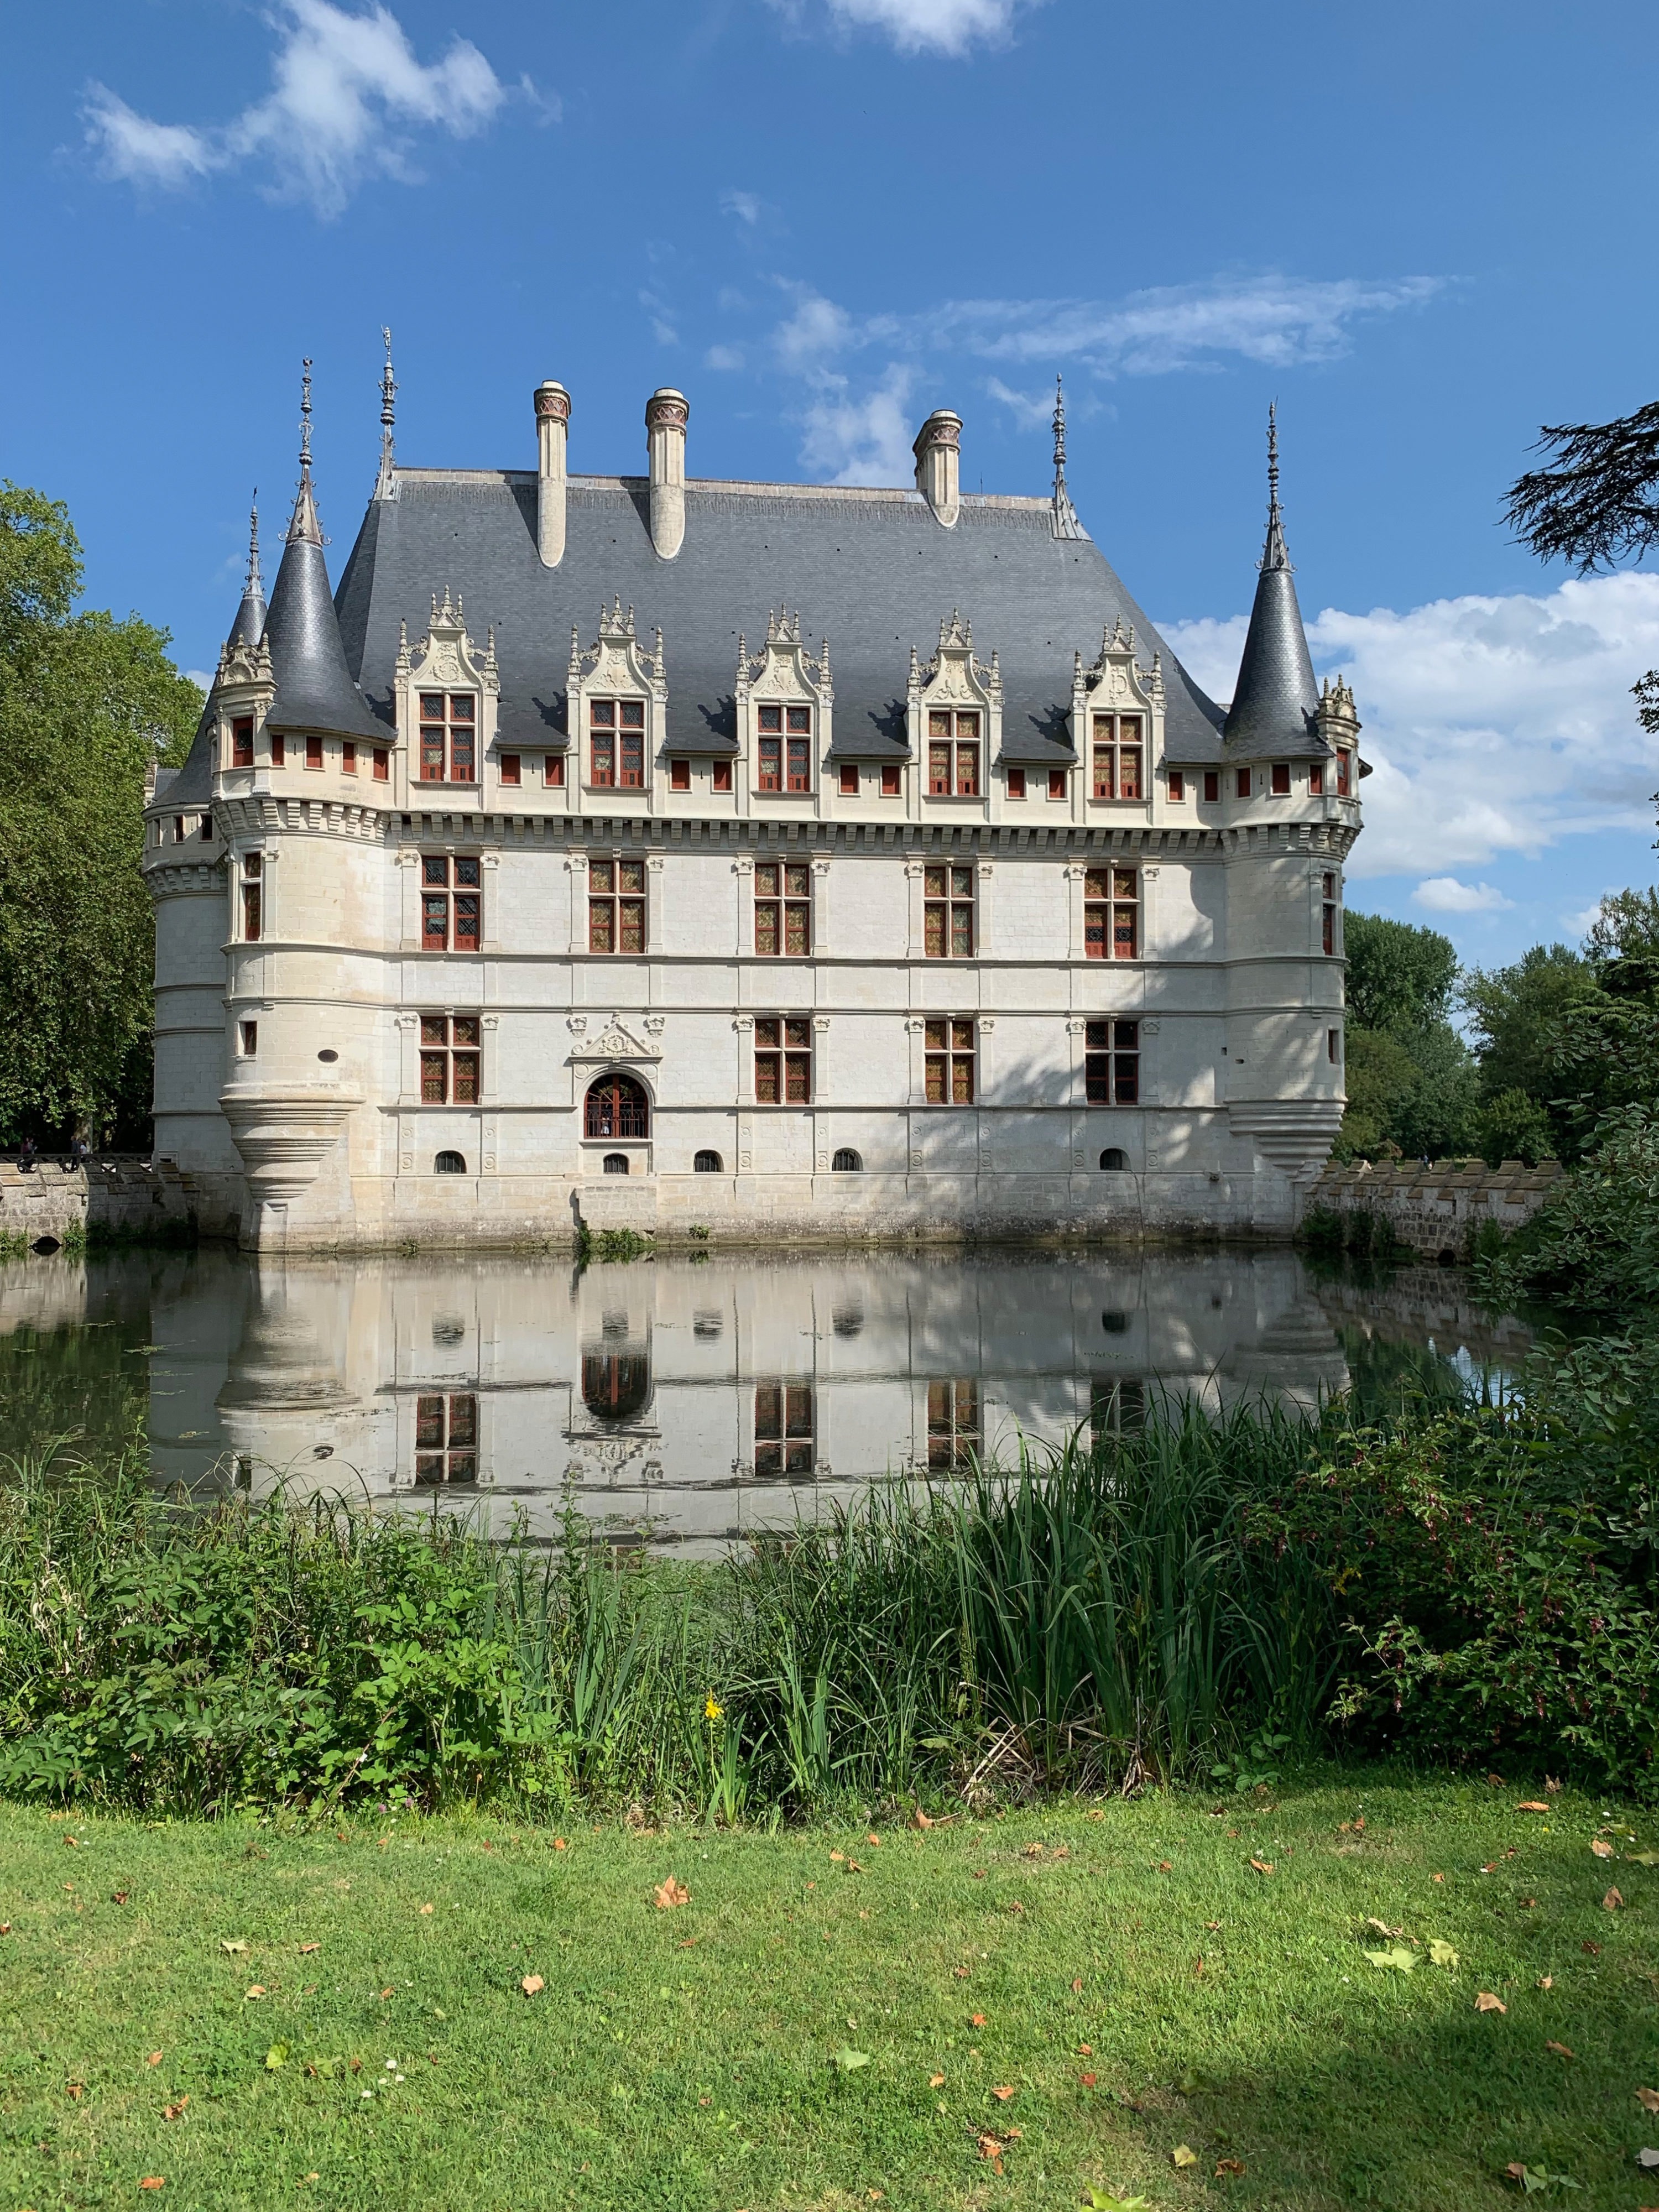 Azay-le-Rideau, das vom Indre umflossene Renaissance-Schloss Nebenfront